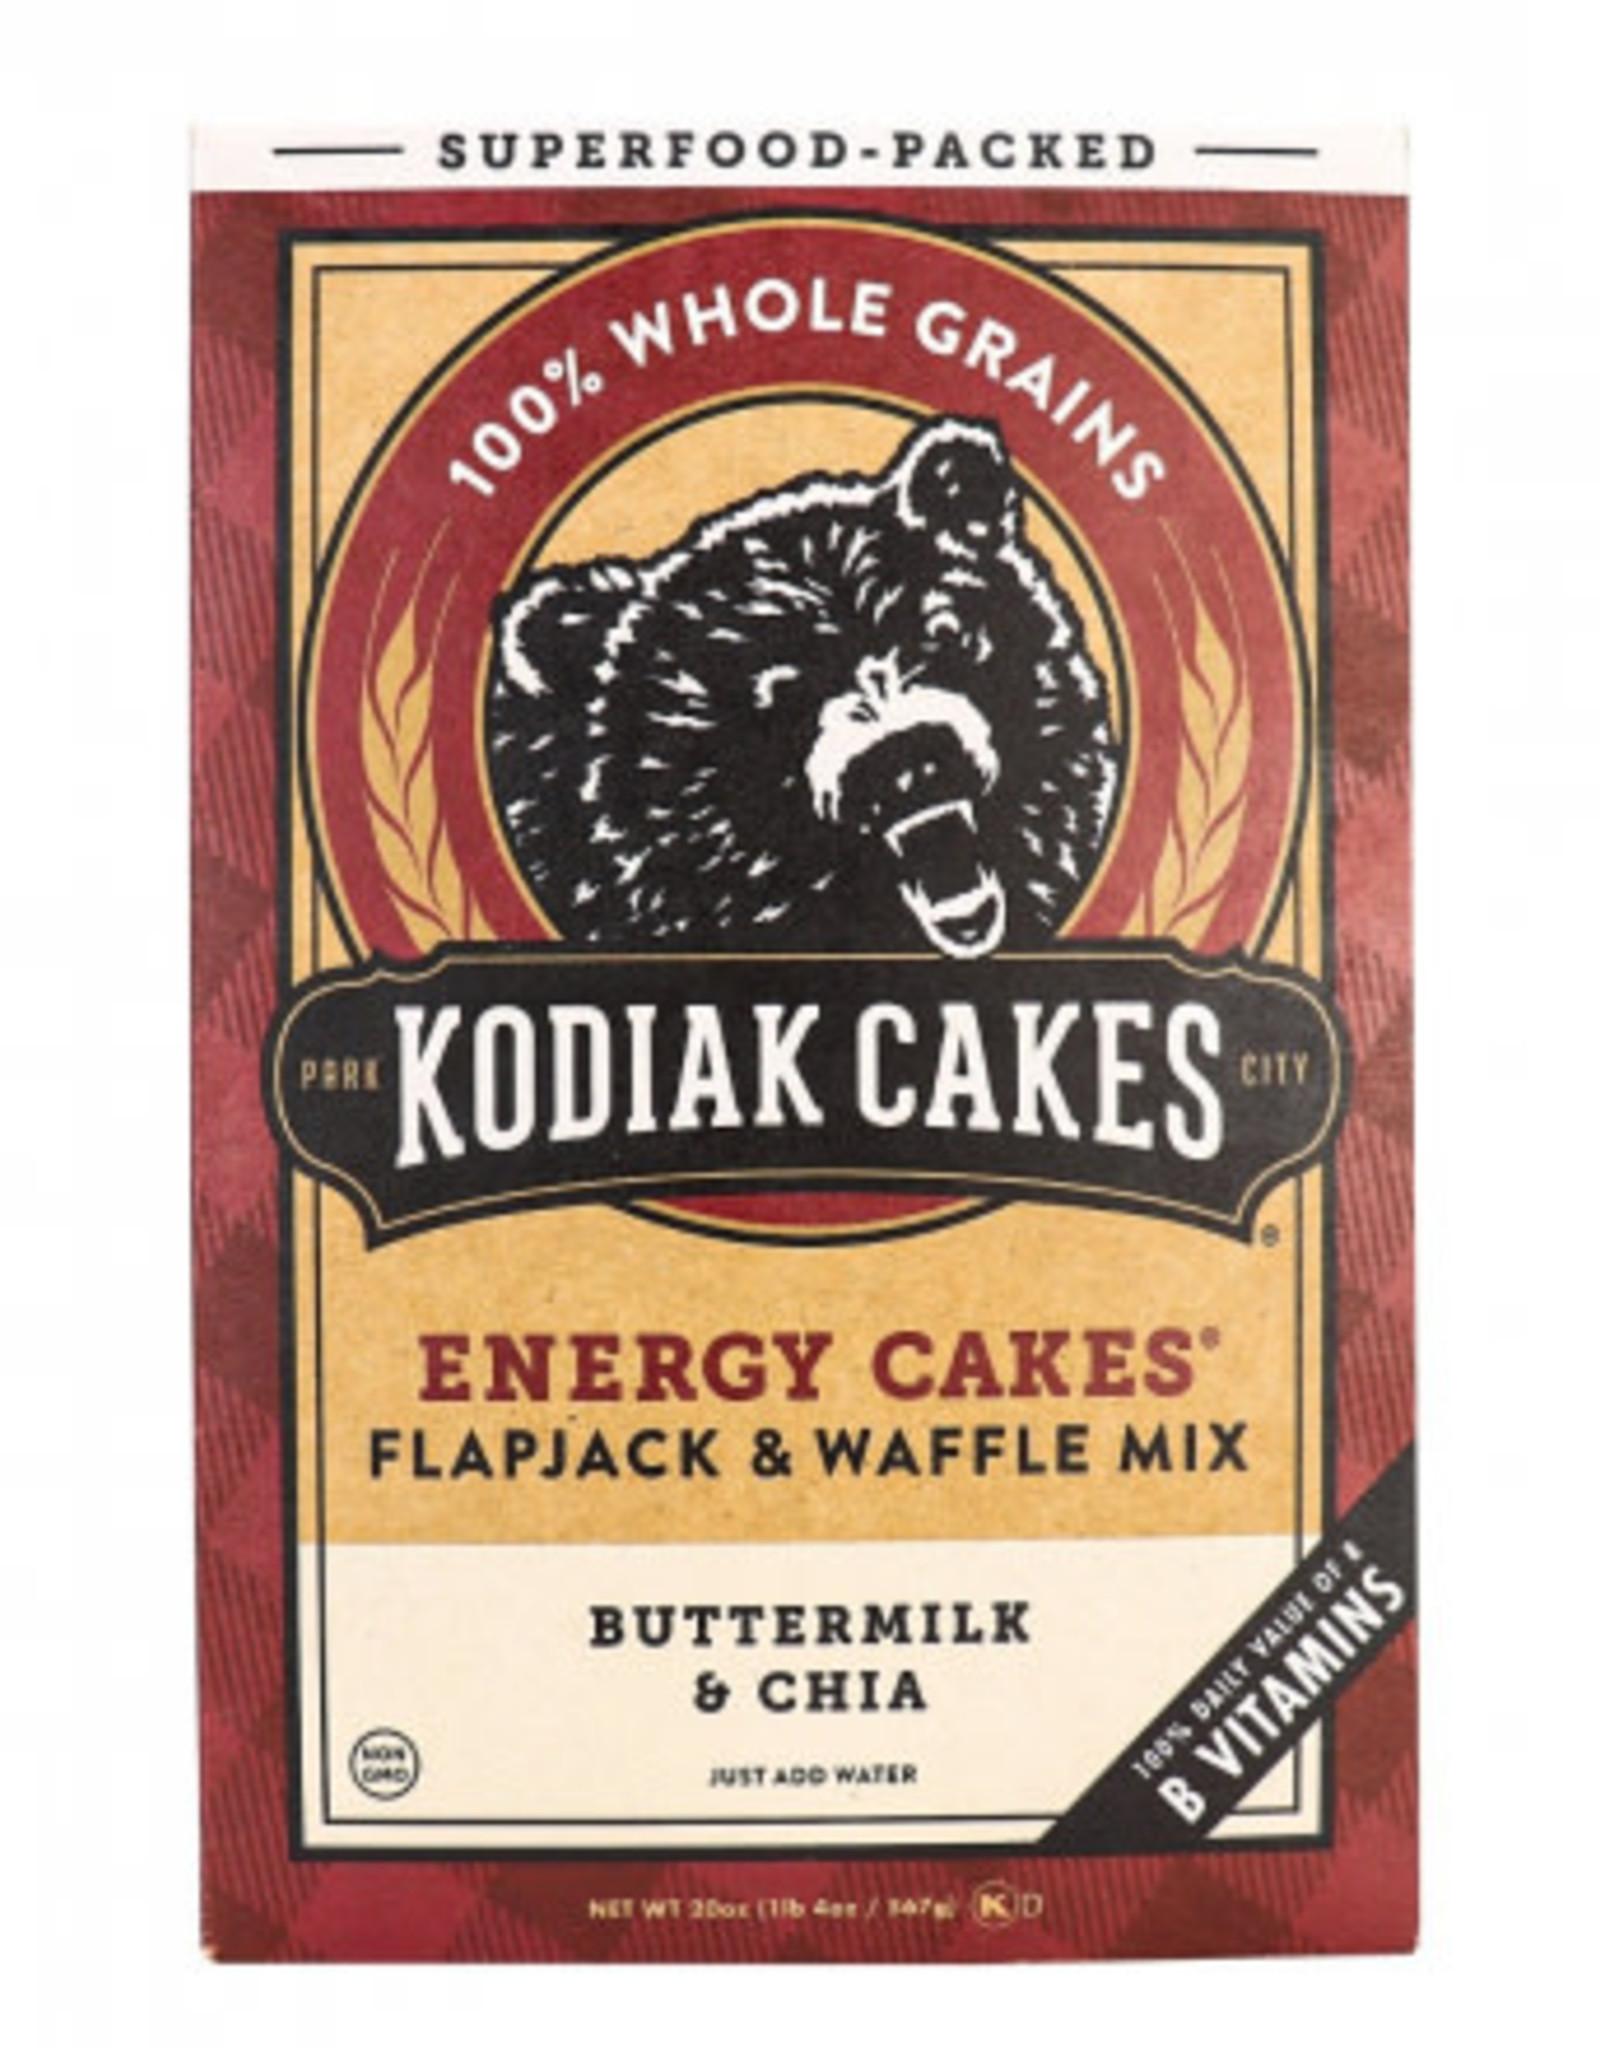 Kodiak Cakes Kodiak Cakes - Flapjack & Waffle Mix, Buttermilk & Chia (567g)